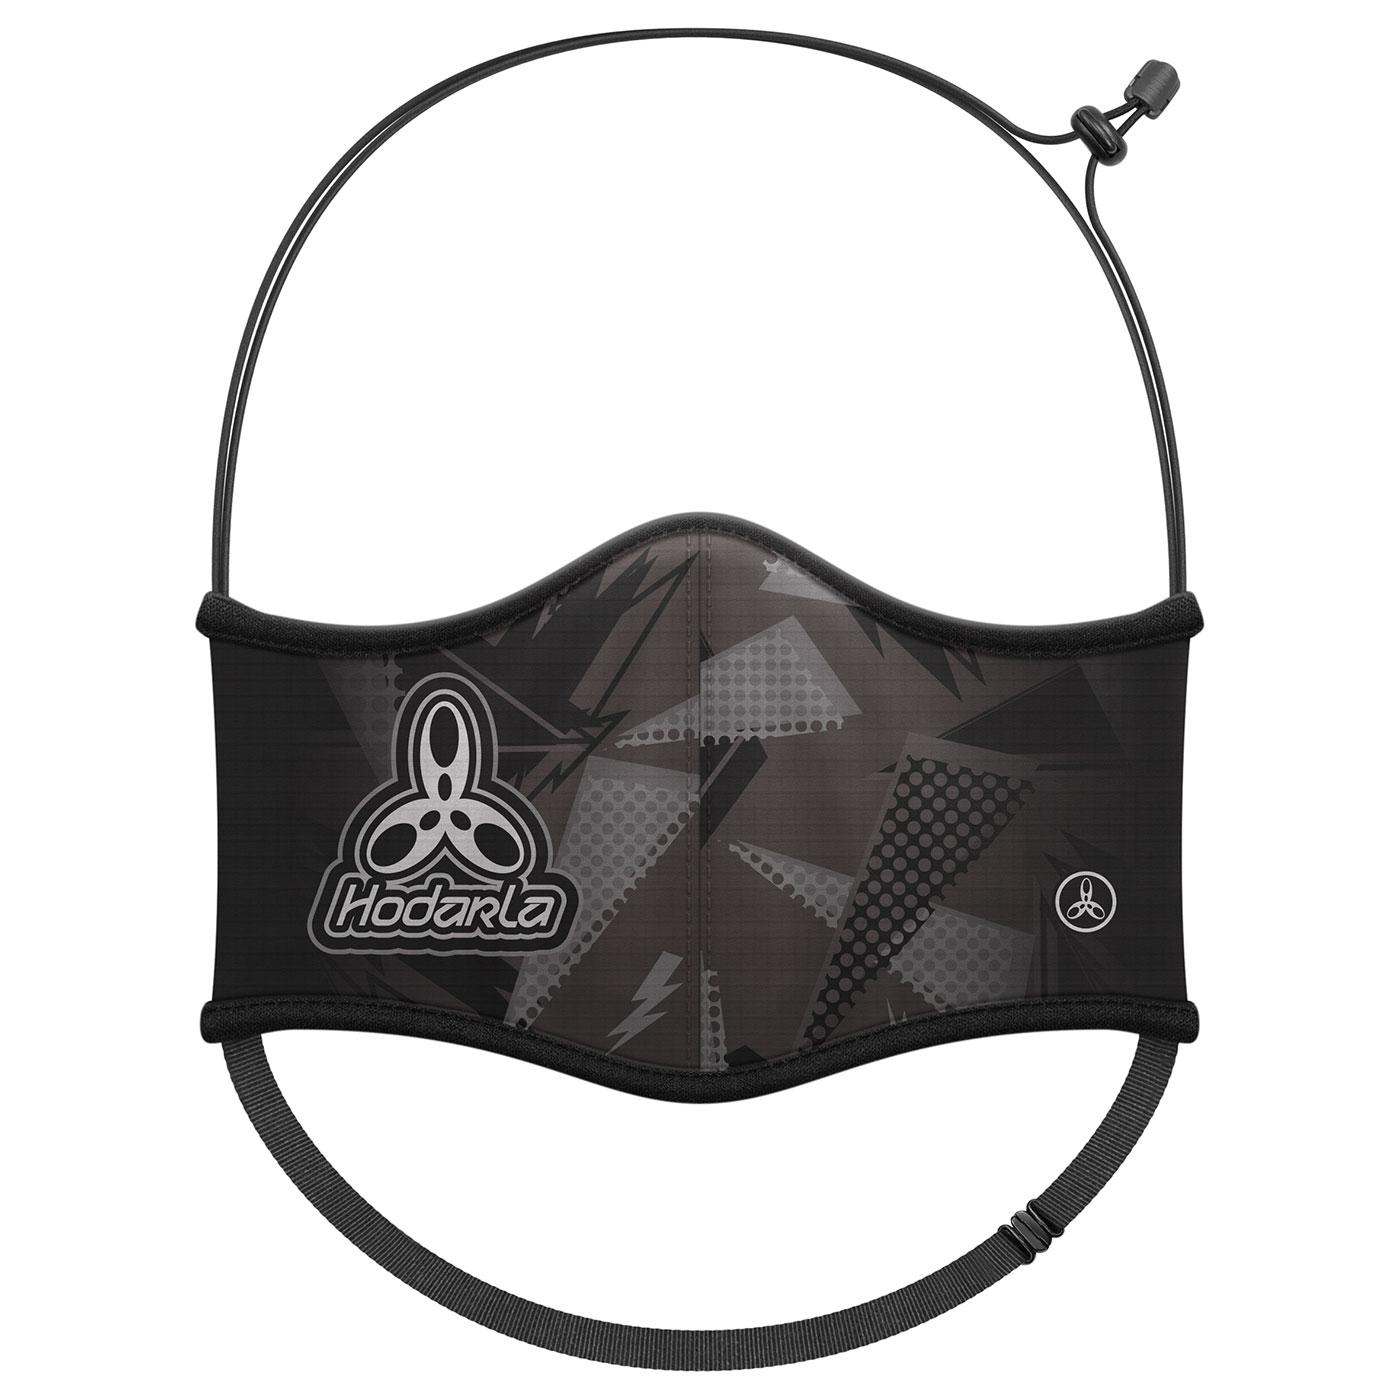 HODARLA AIR 運動舒適口罩 6032249 - 黑灰白